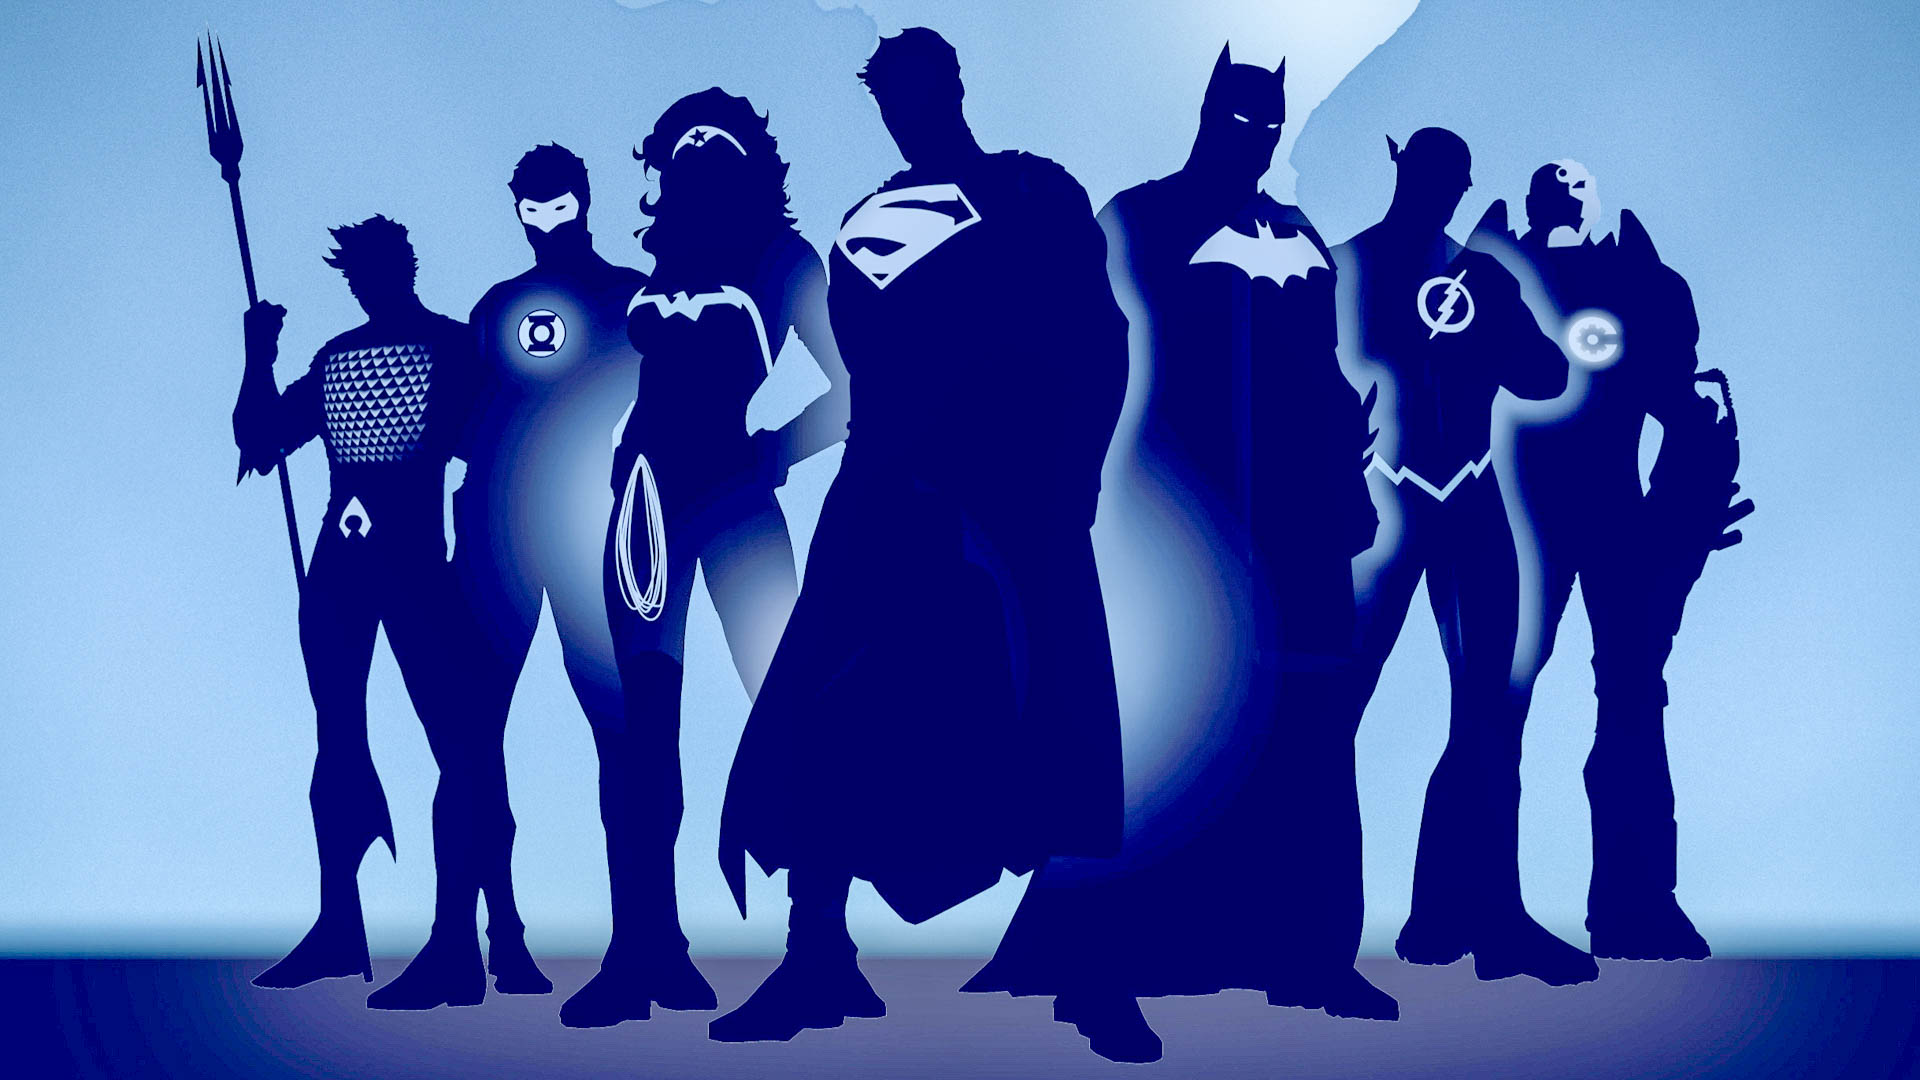 Justiceleaguewallpaper Justice League HD Wallpapers Backgrounds Wallpaper 1920x1080